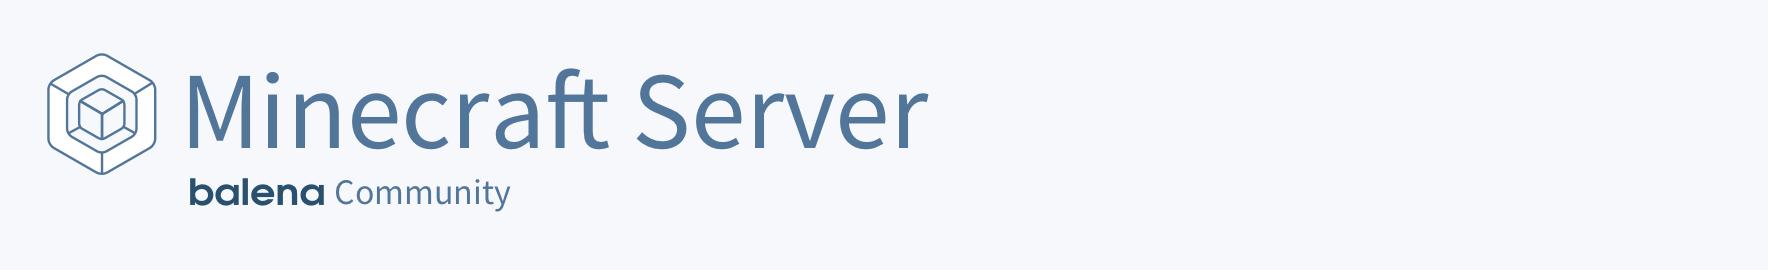 balena Minecraft Server logo